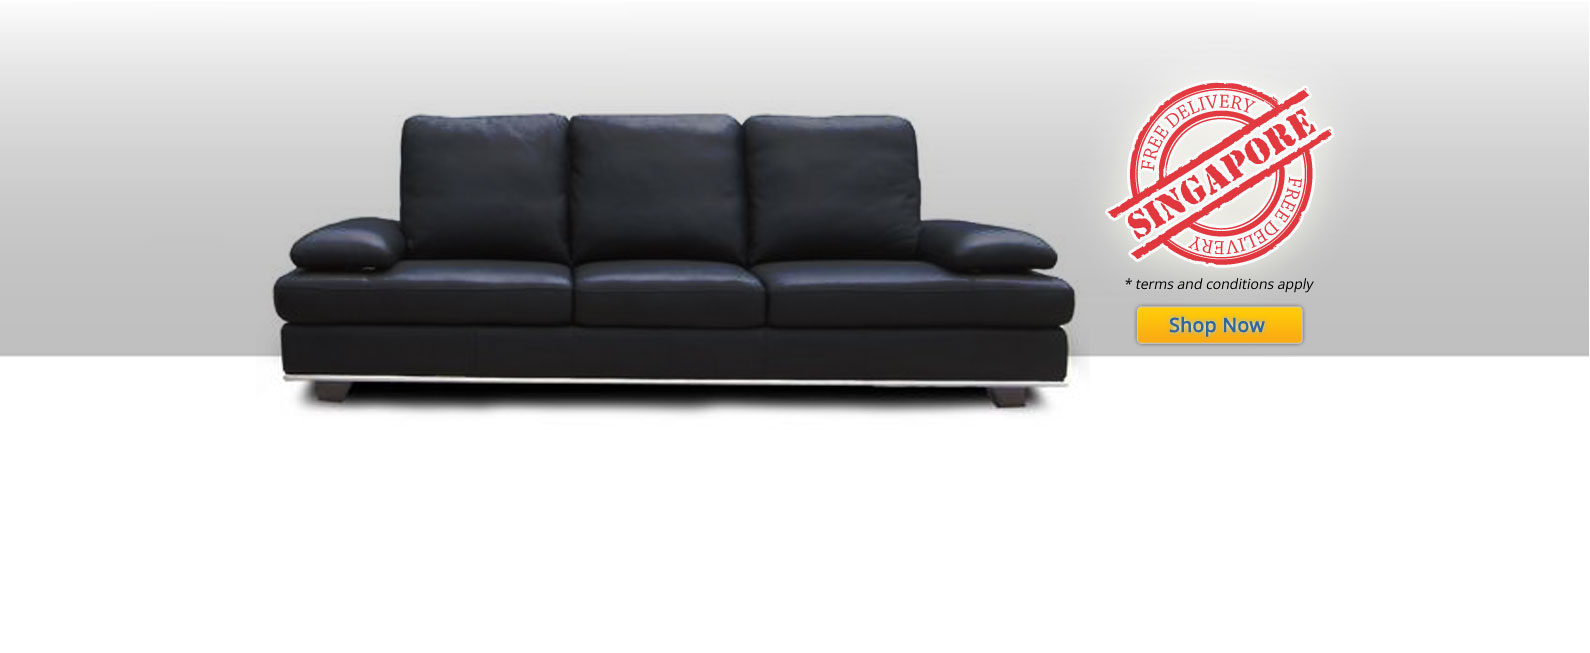 Home Rossini Furniture Quality Furniture Company In Johor Bahru Malaysia